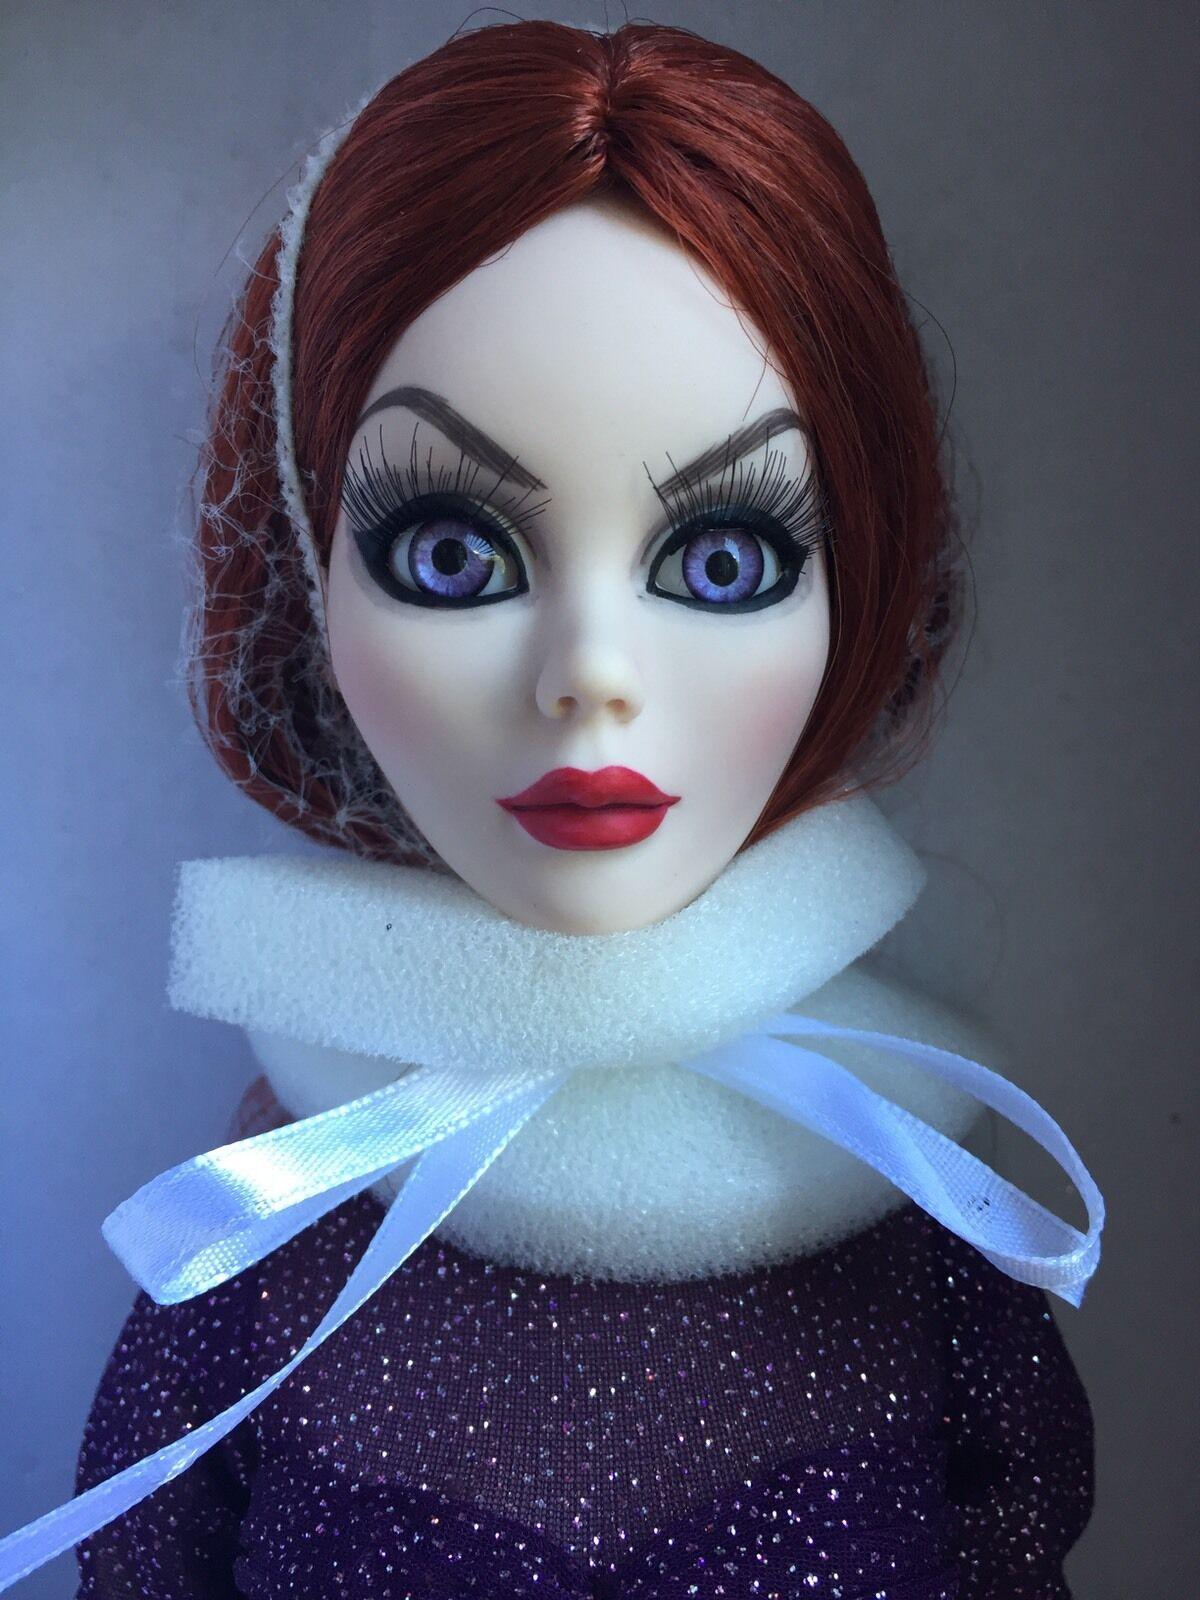 Tonner Wilde Imagination Evangeline Orribile Mortal Love 18.5   Bambola Fashion